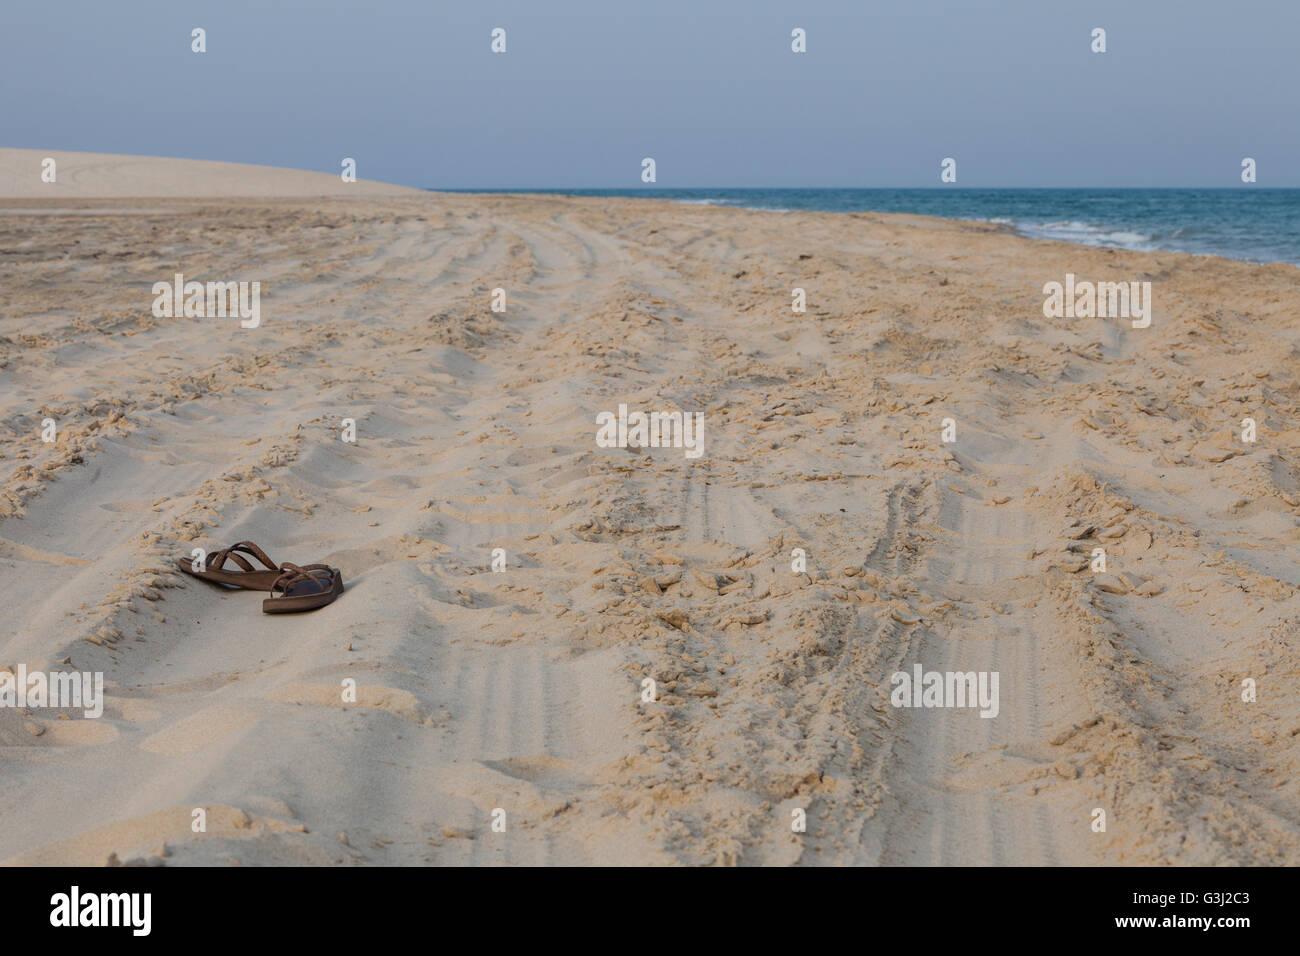 The coast of  Qatar.  Abandoned leather sandals. - Stock Image